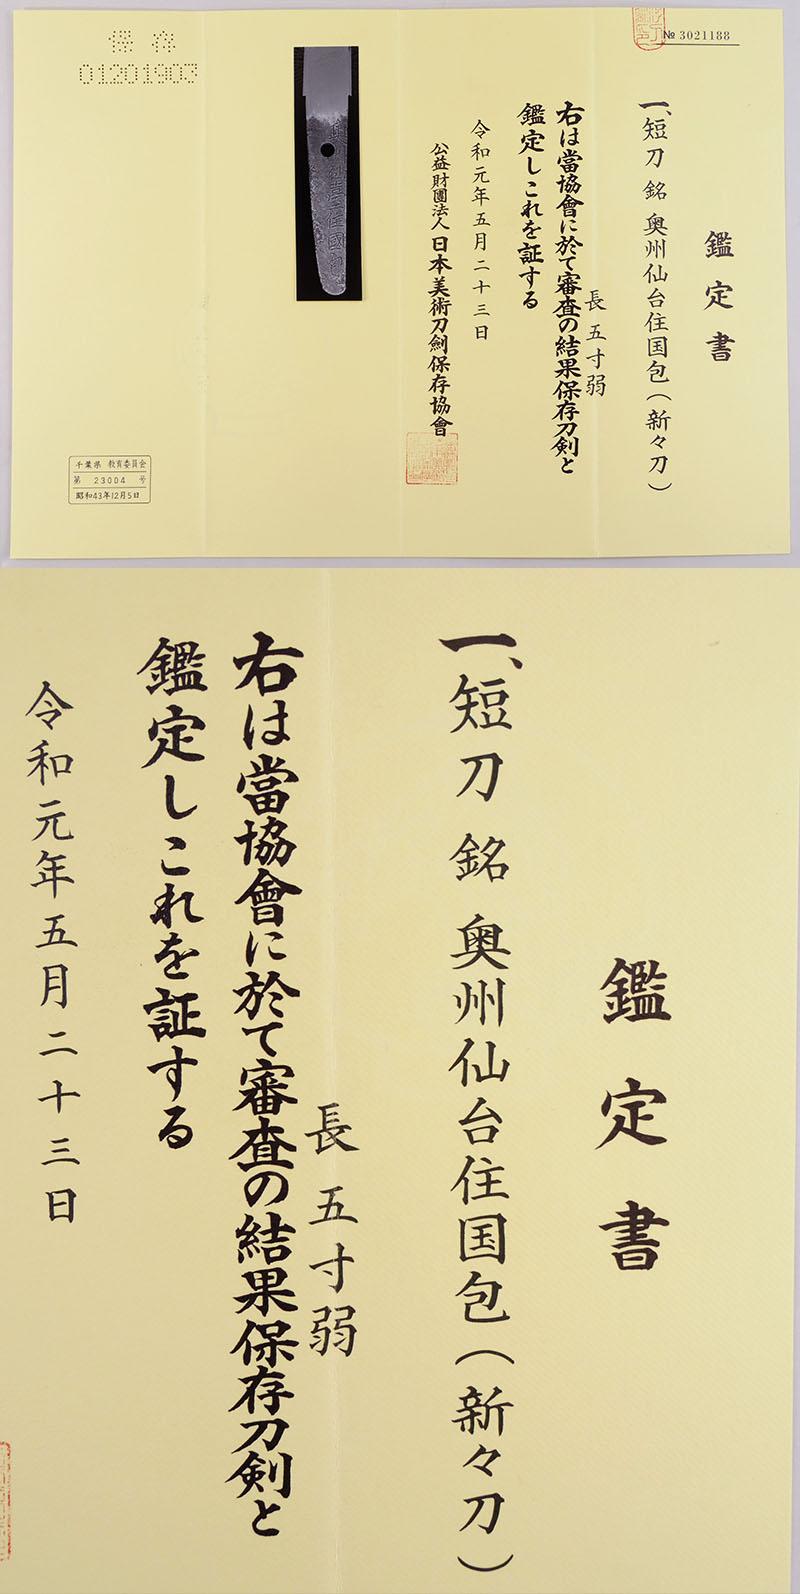 奥州仙台住国包(保昌伝) Picture of Certificate